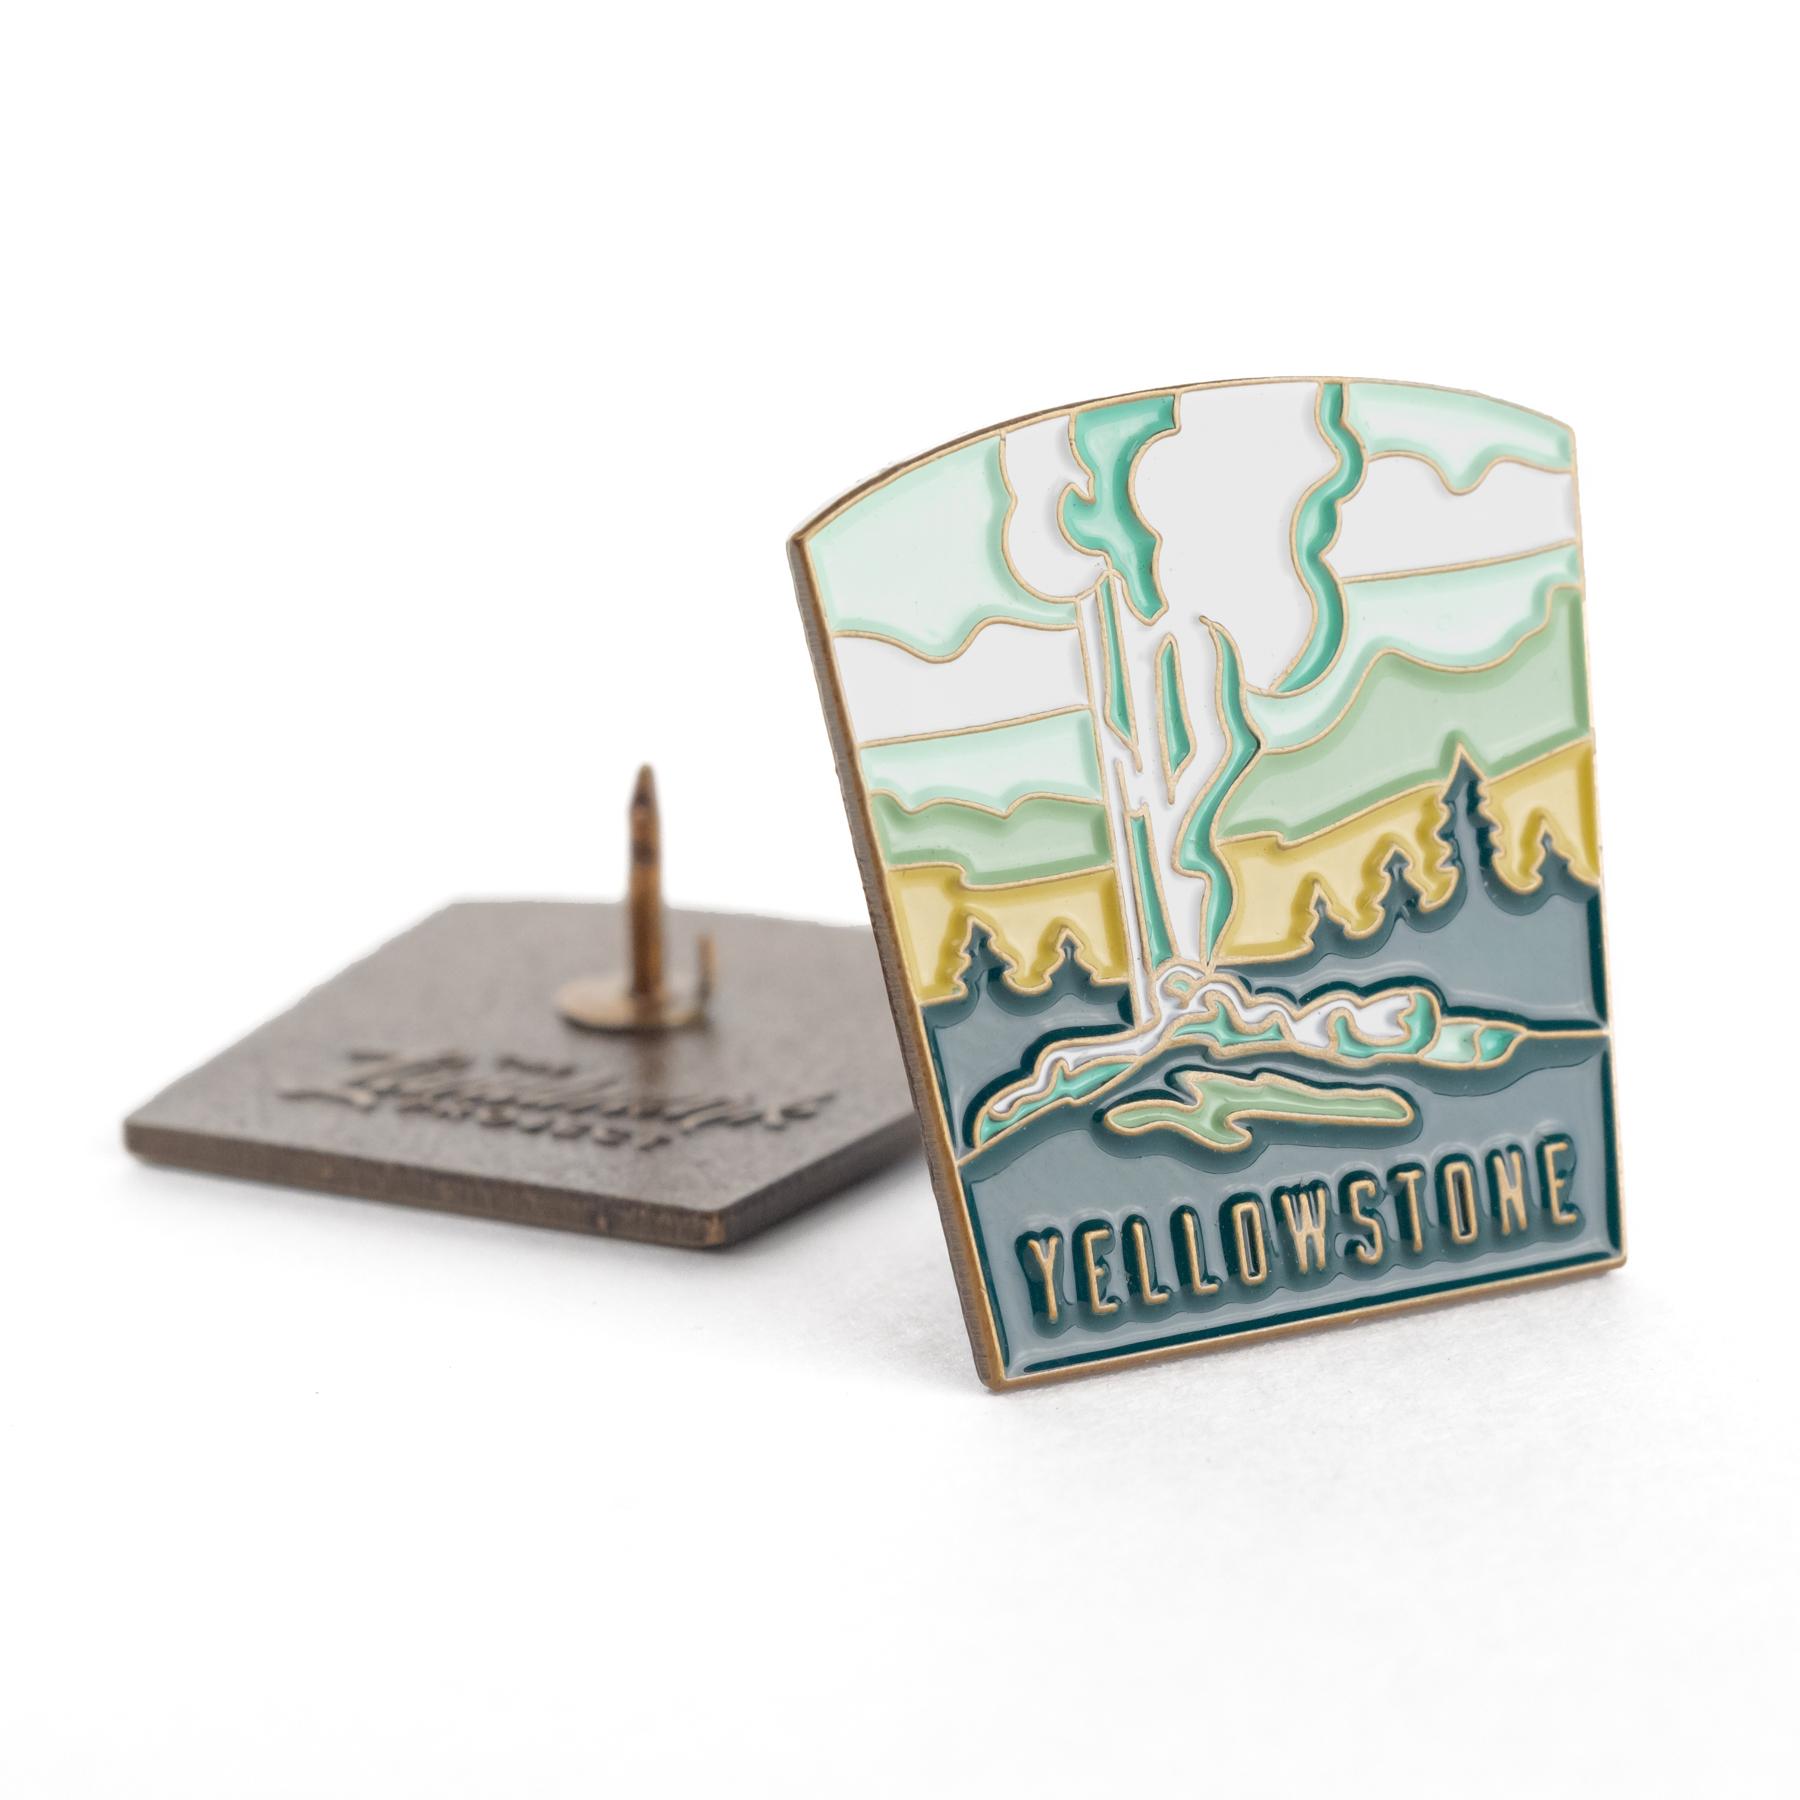 yellowstone-enamel-pin.jpg